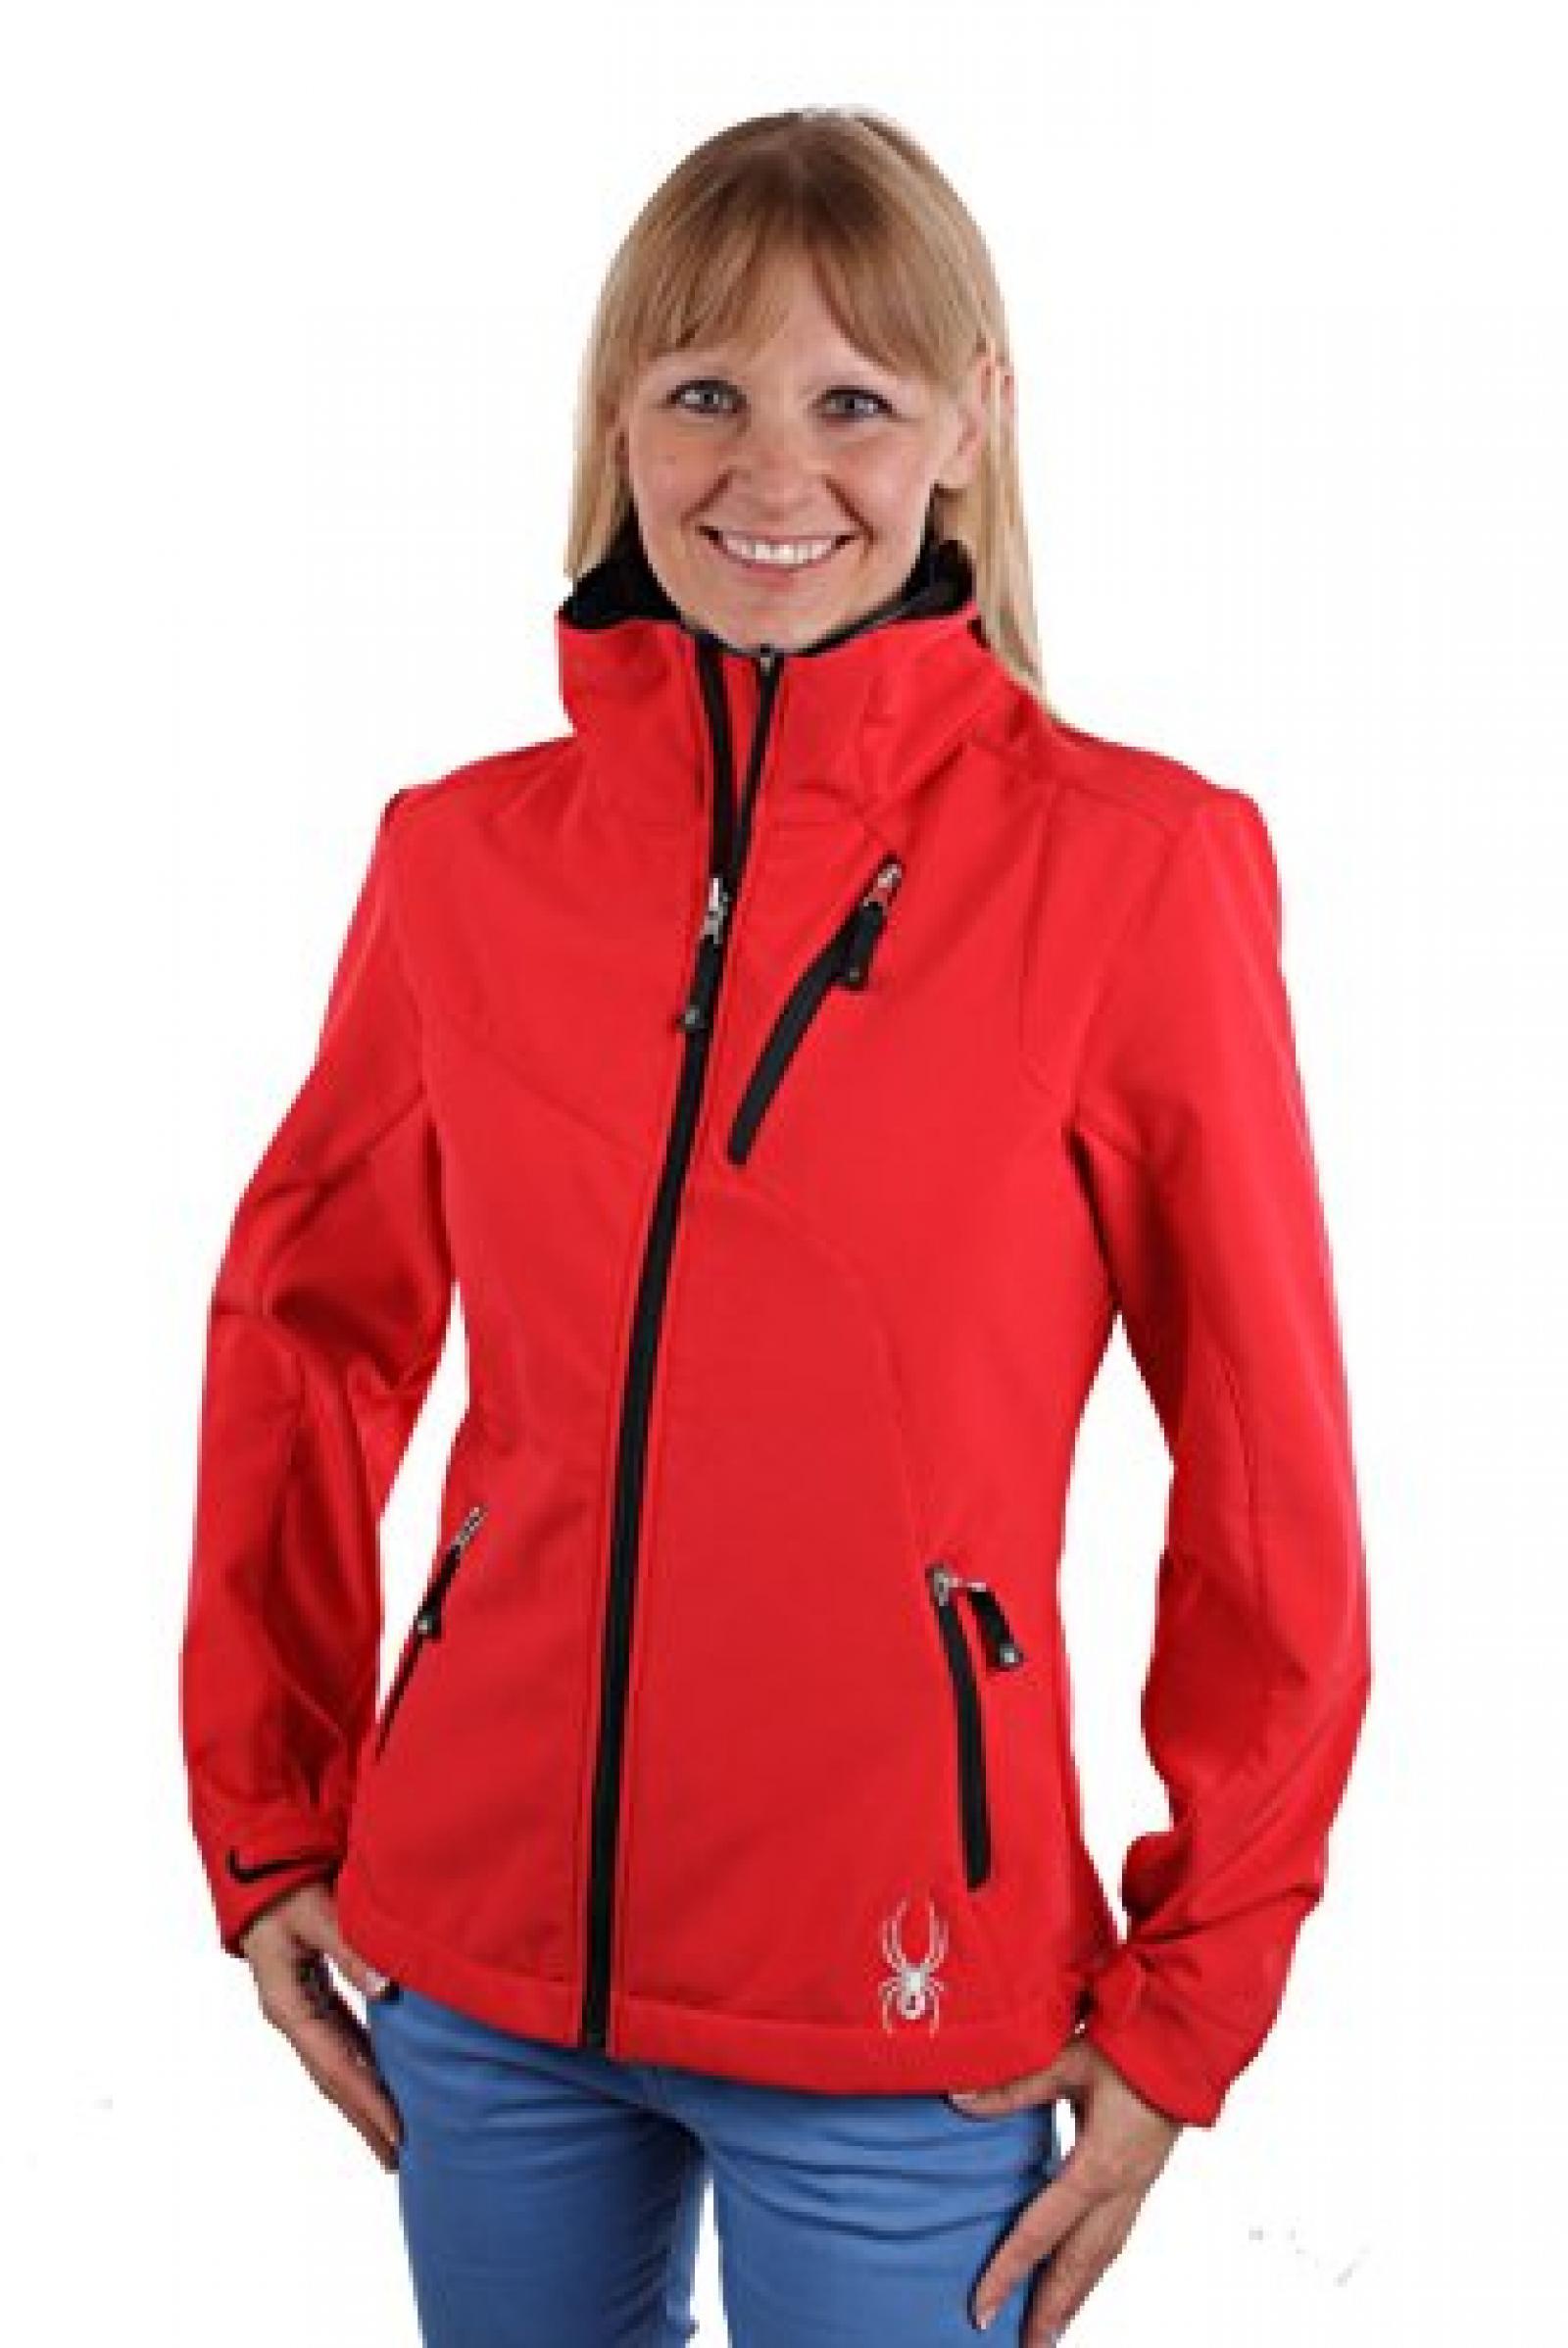 Spyder Damen Softshell Jacke Mont Blanc 2014/2015 Rot Gr. 40 #SP105A